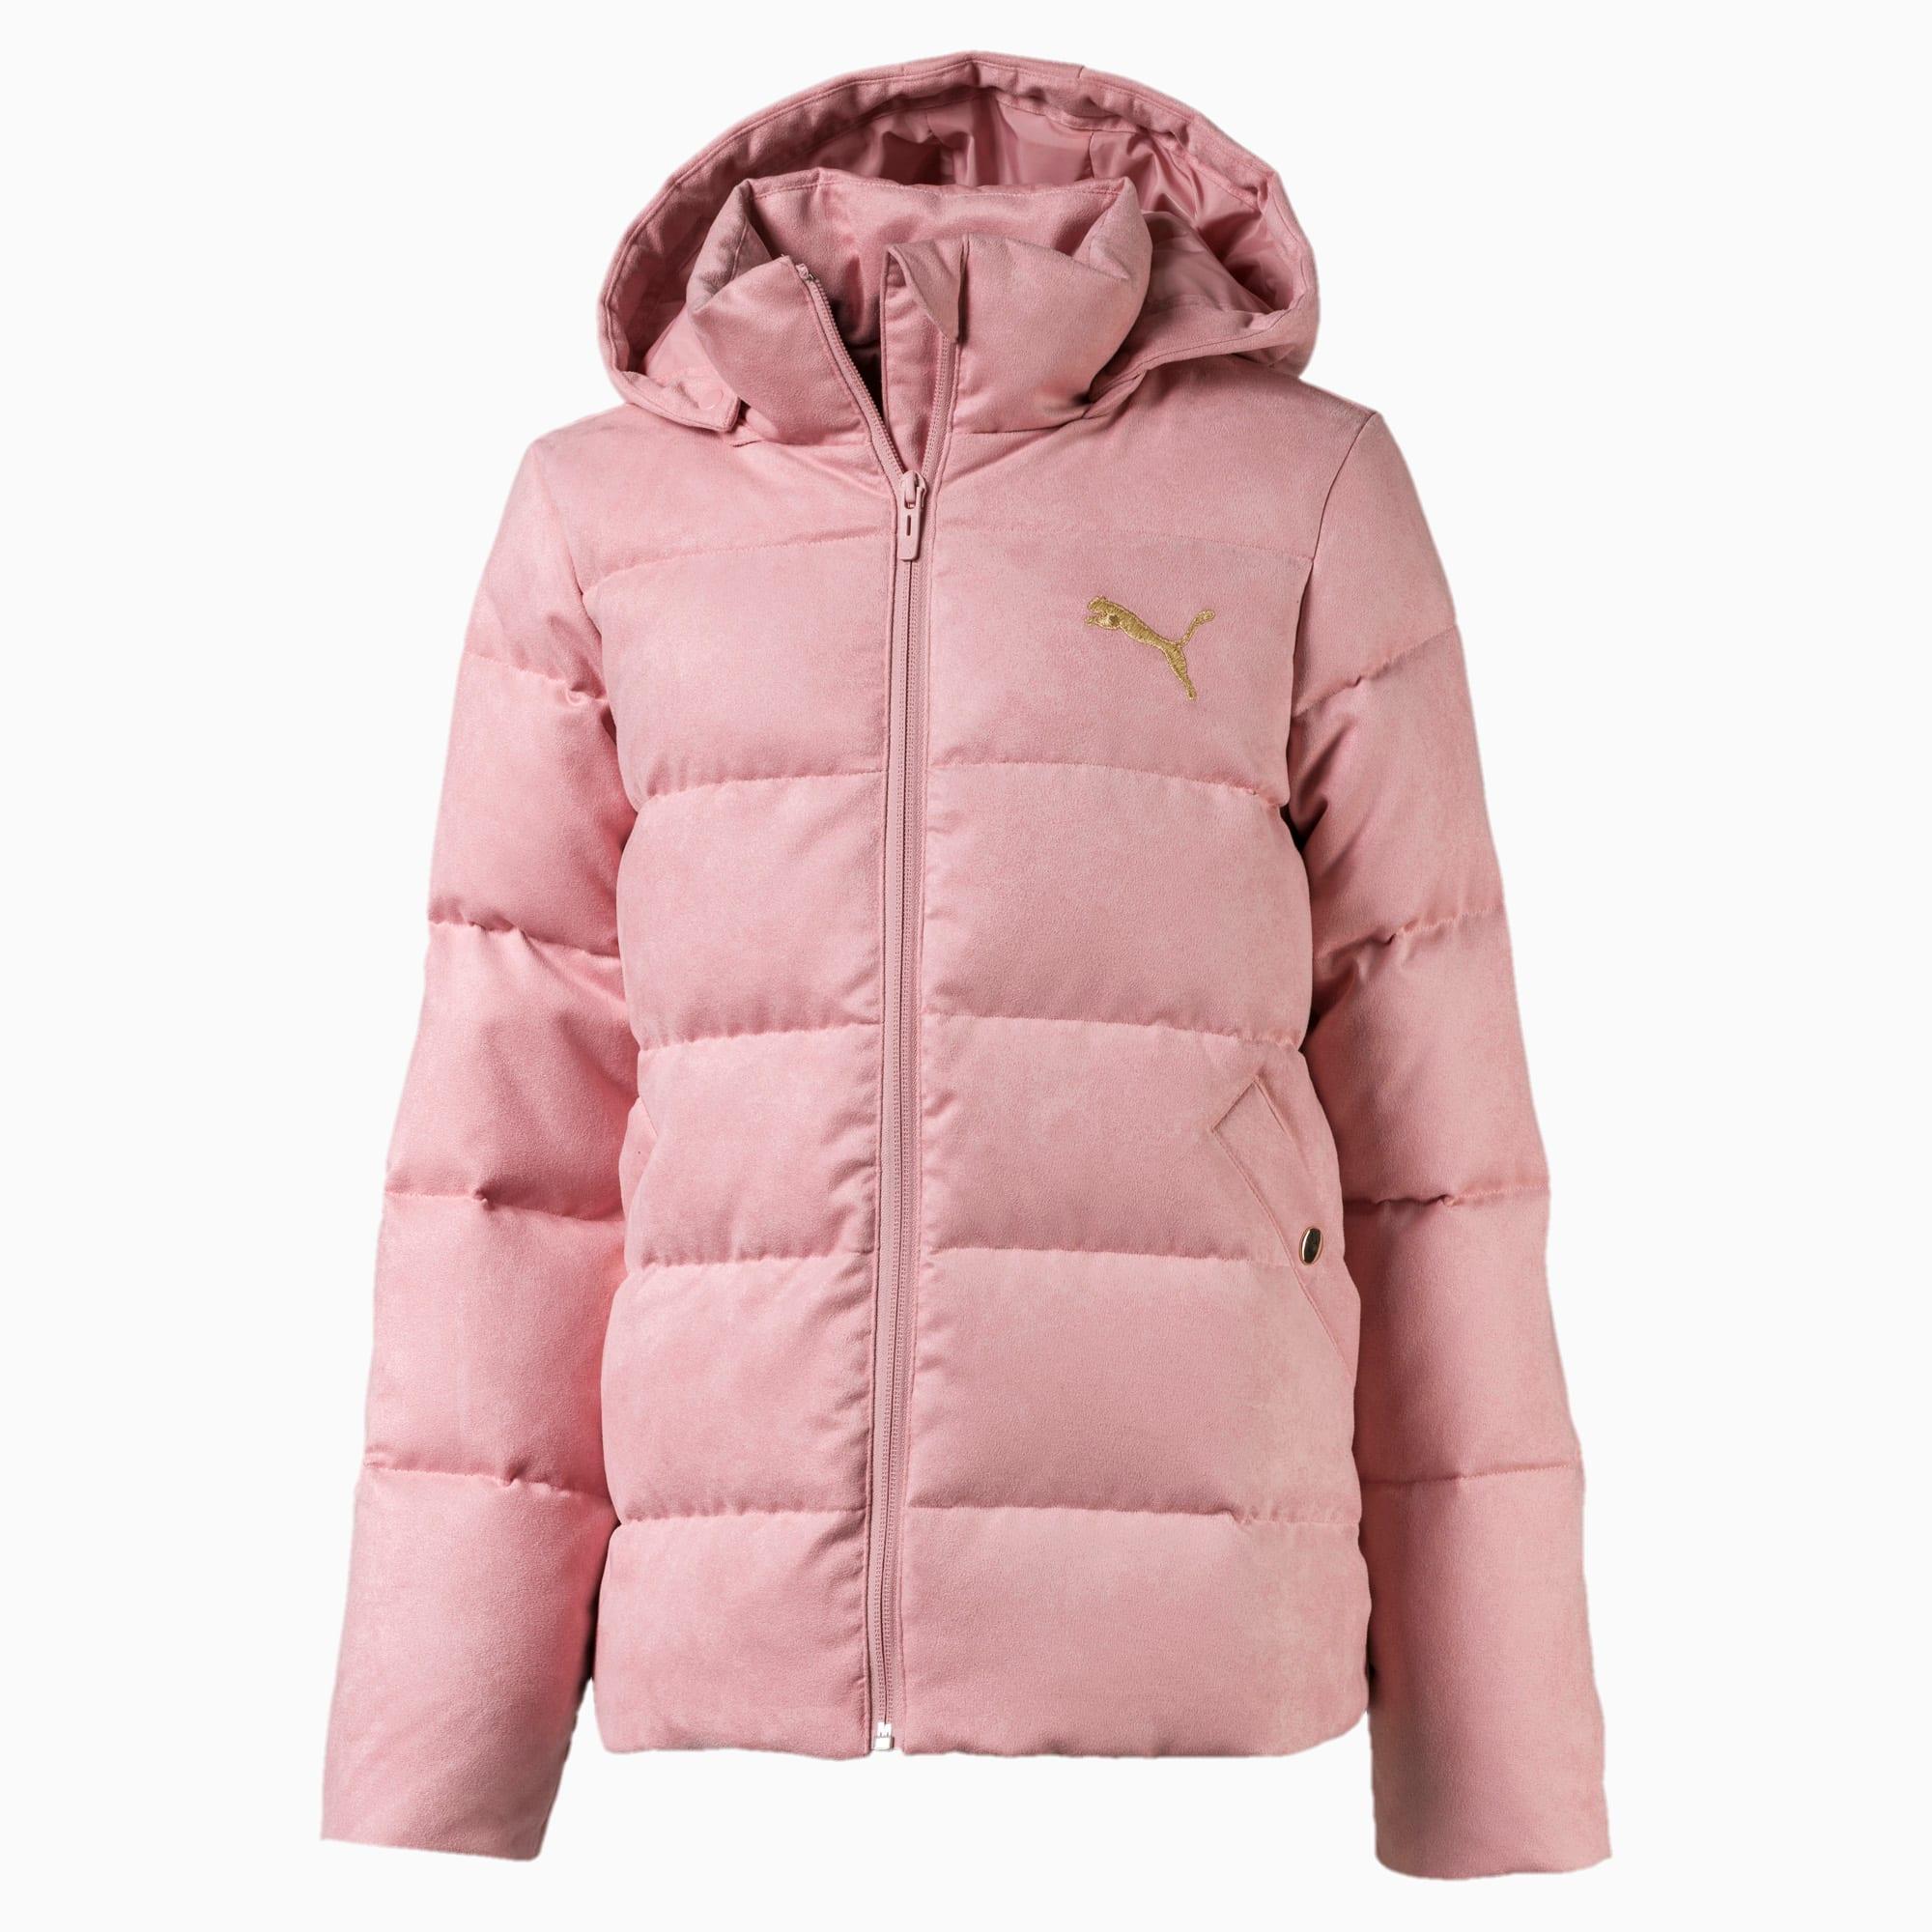 Velour Girls' Down Jacket